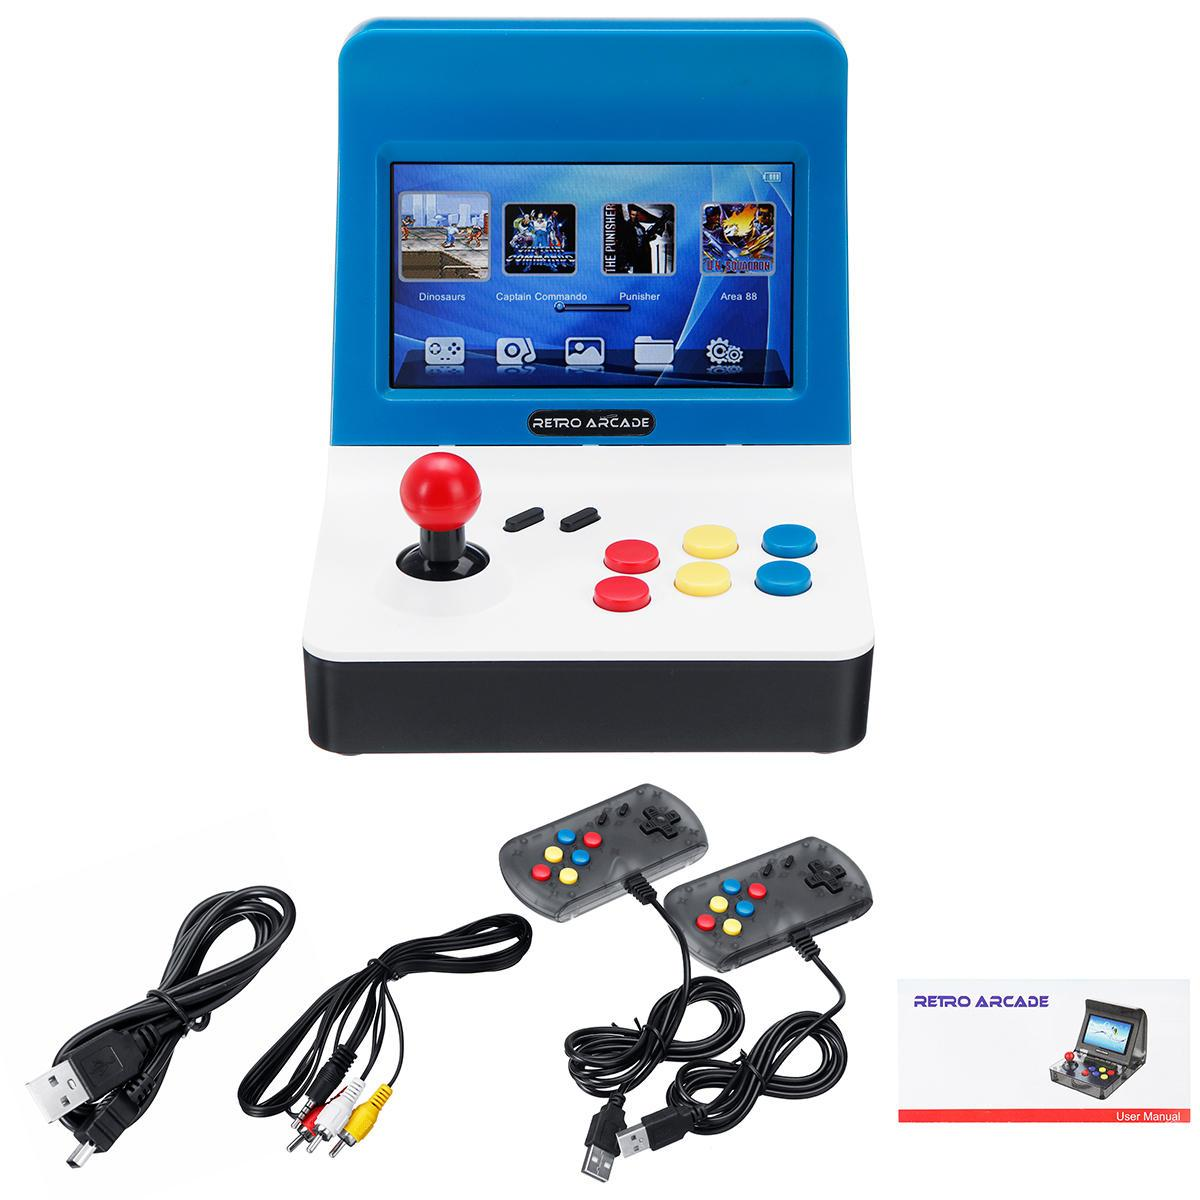 NEOGEO Retro Arcade Mini El Oyun Konsolu 3000 Klasik Video Oyunları